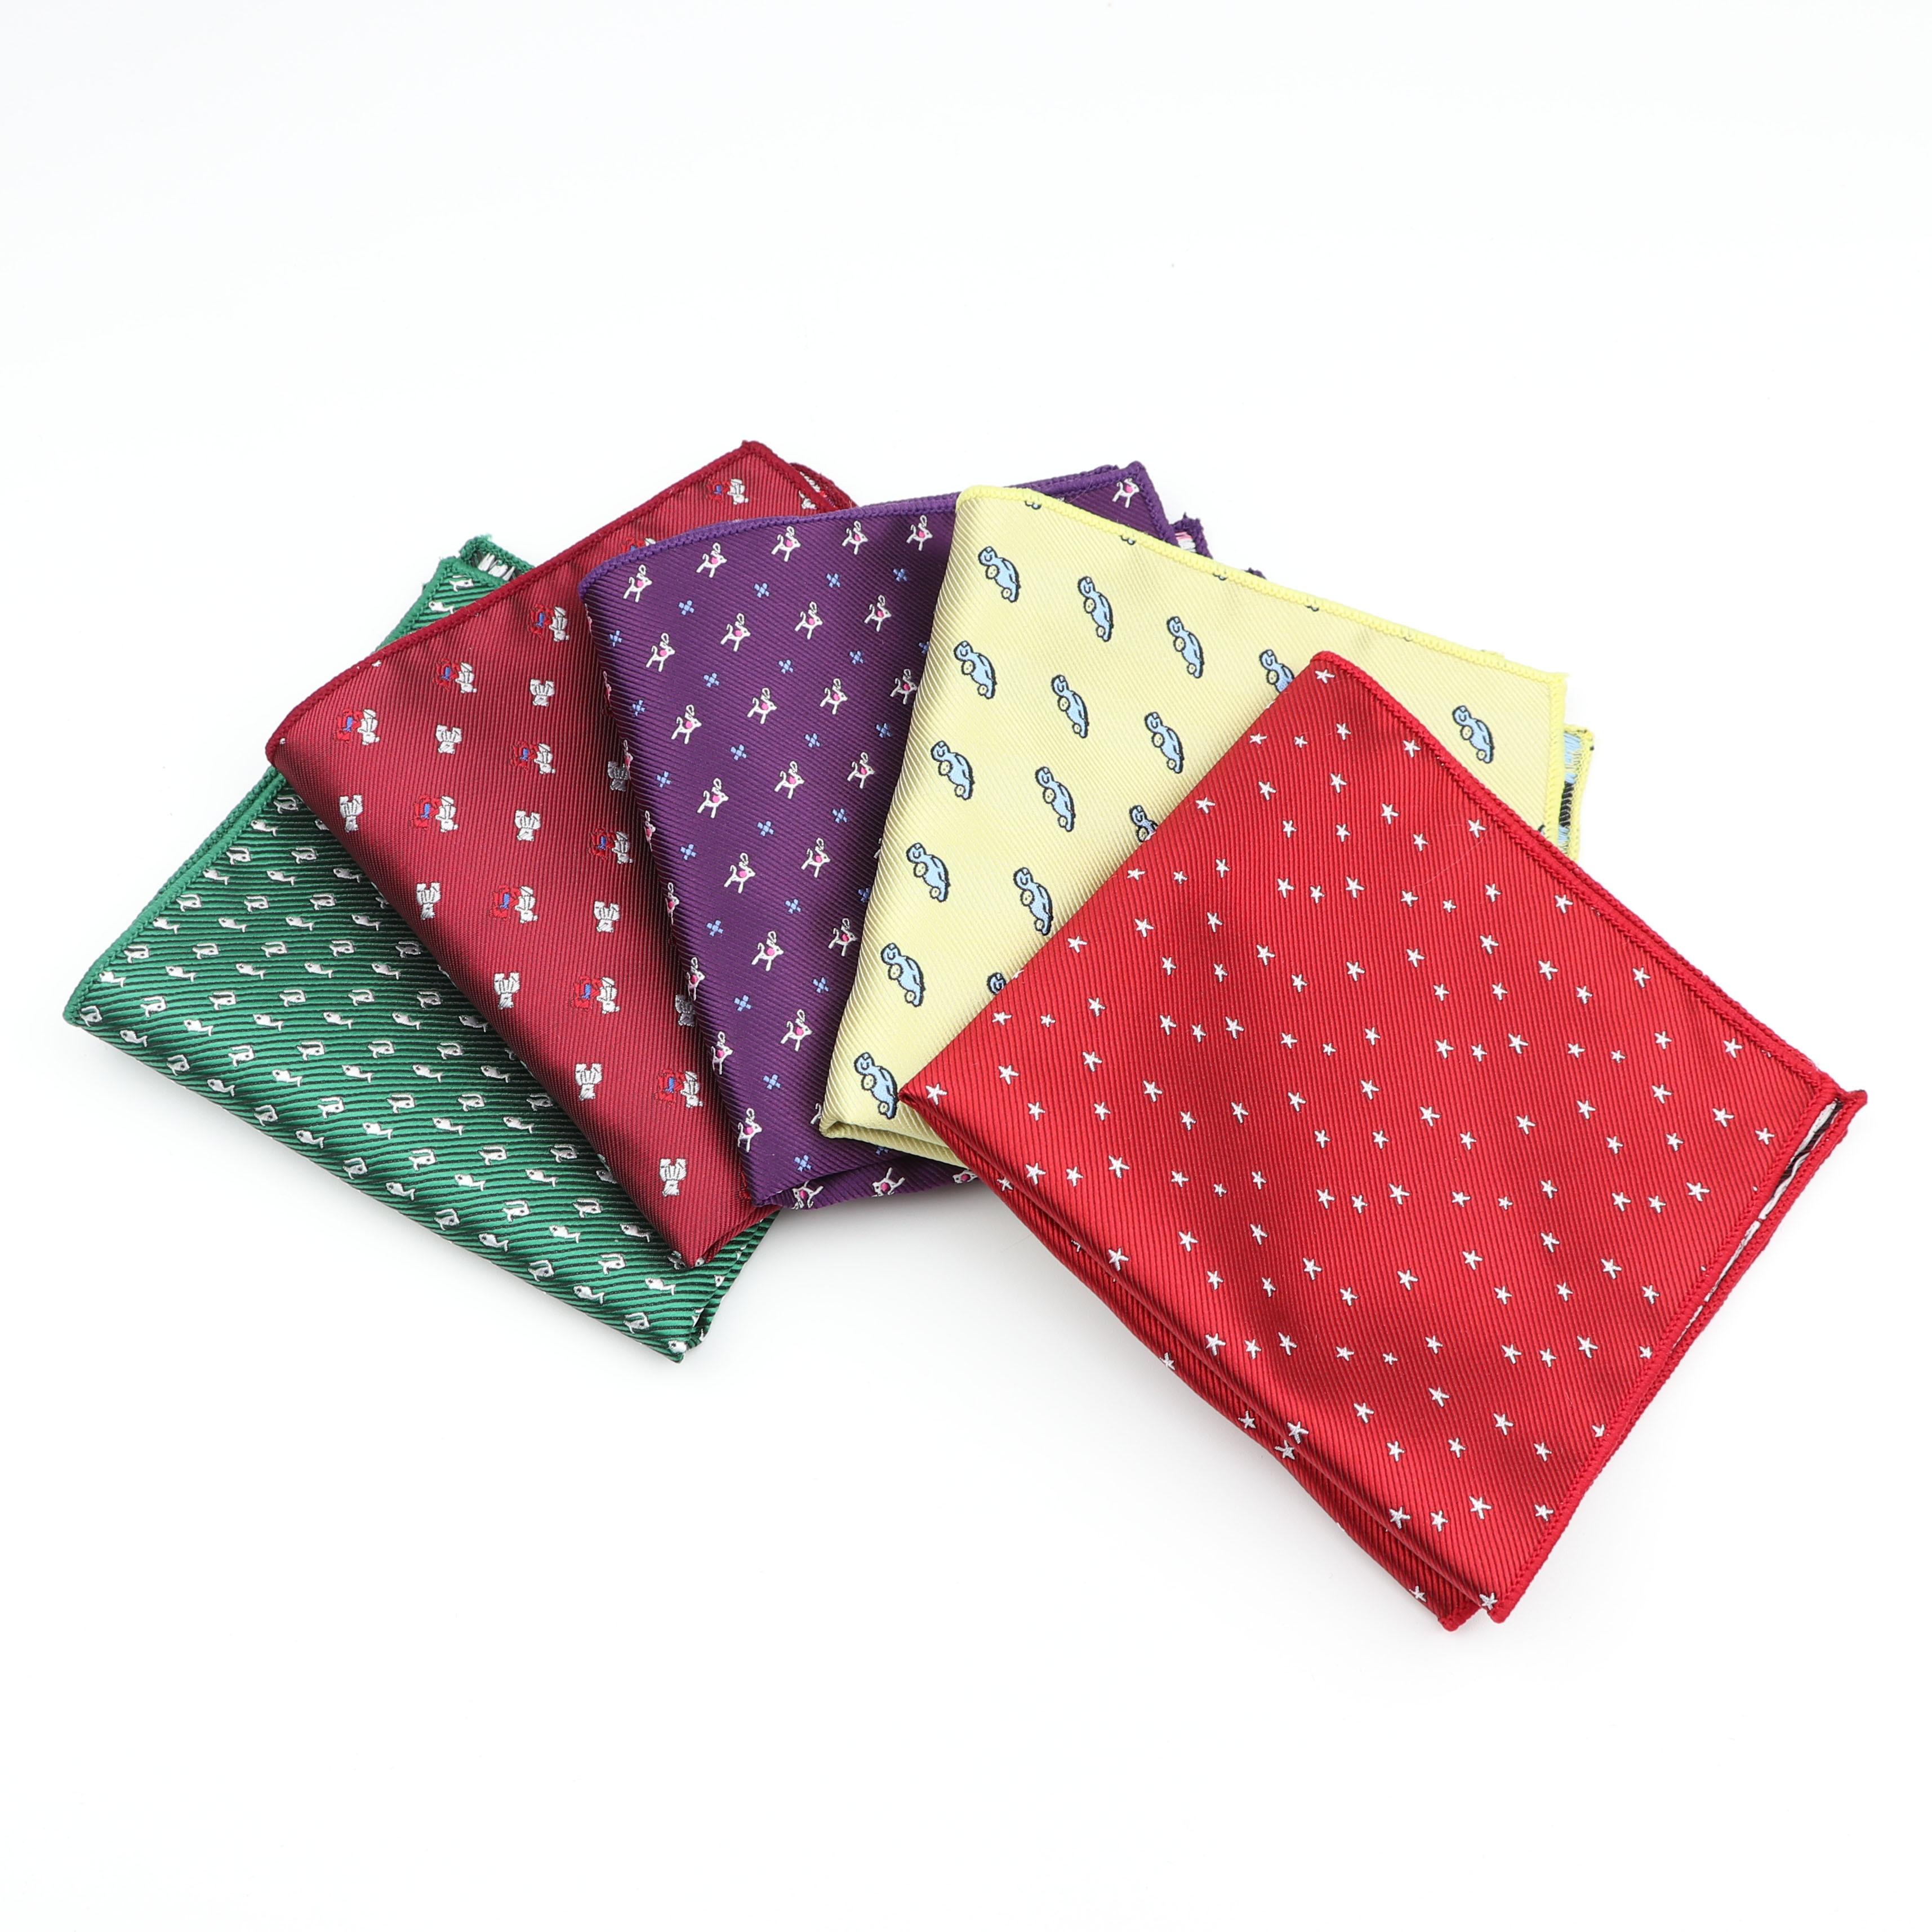 Polyester Handkerchief Scarves Vintage Fabric Hankies Umbrella Star Car Fish Pocket Square 1200 Needles Handkerchiefs 23*23cm